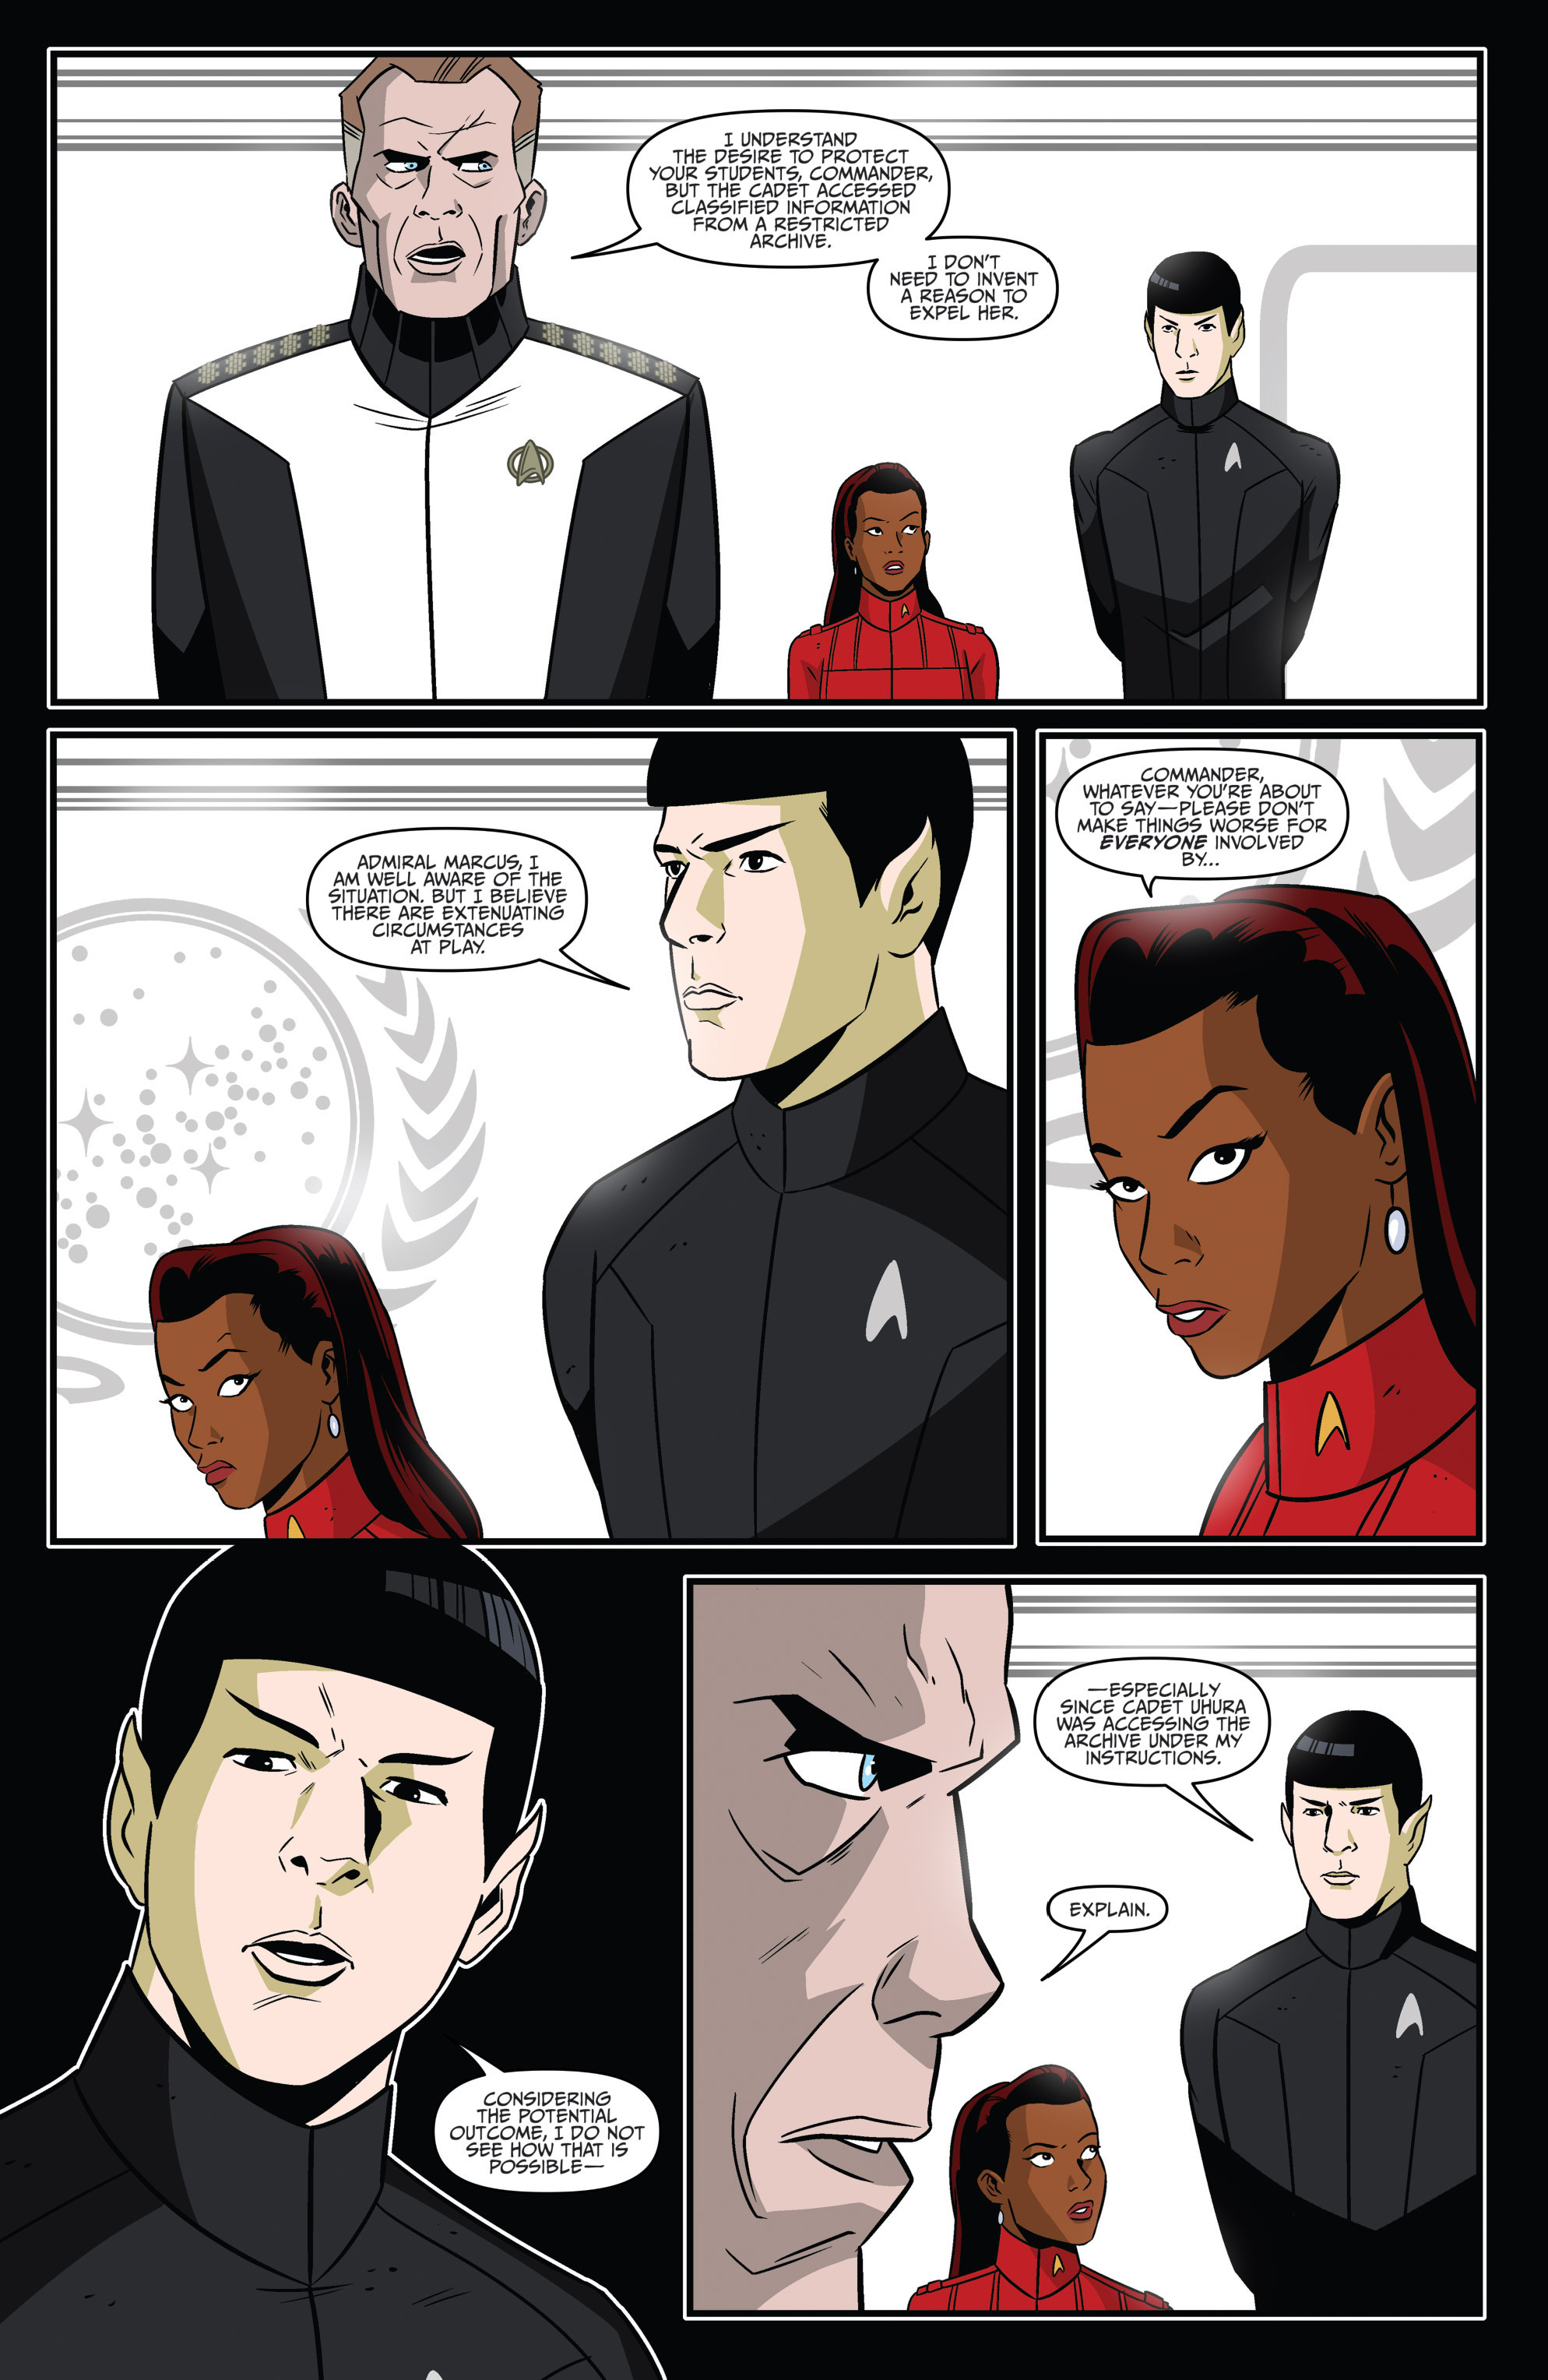 Star Trek: Starfleet Academy (2015) #4 - Read Star Trek